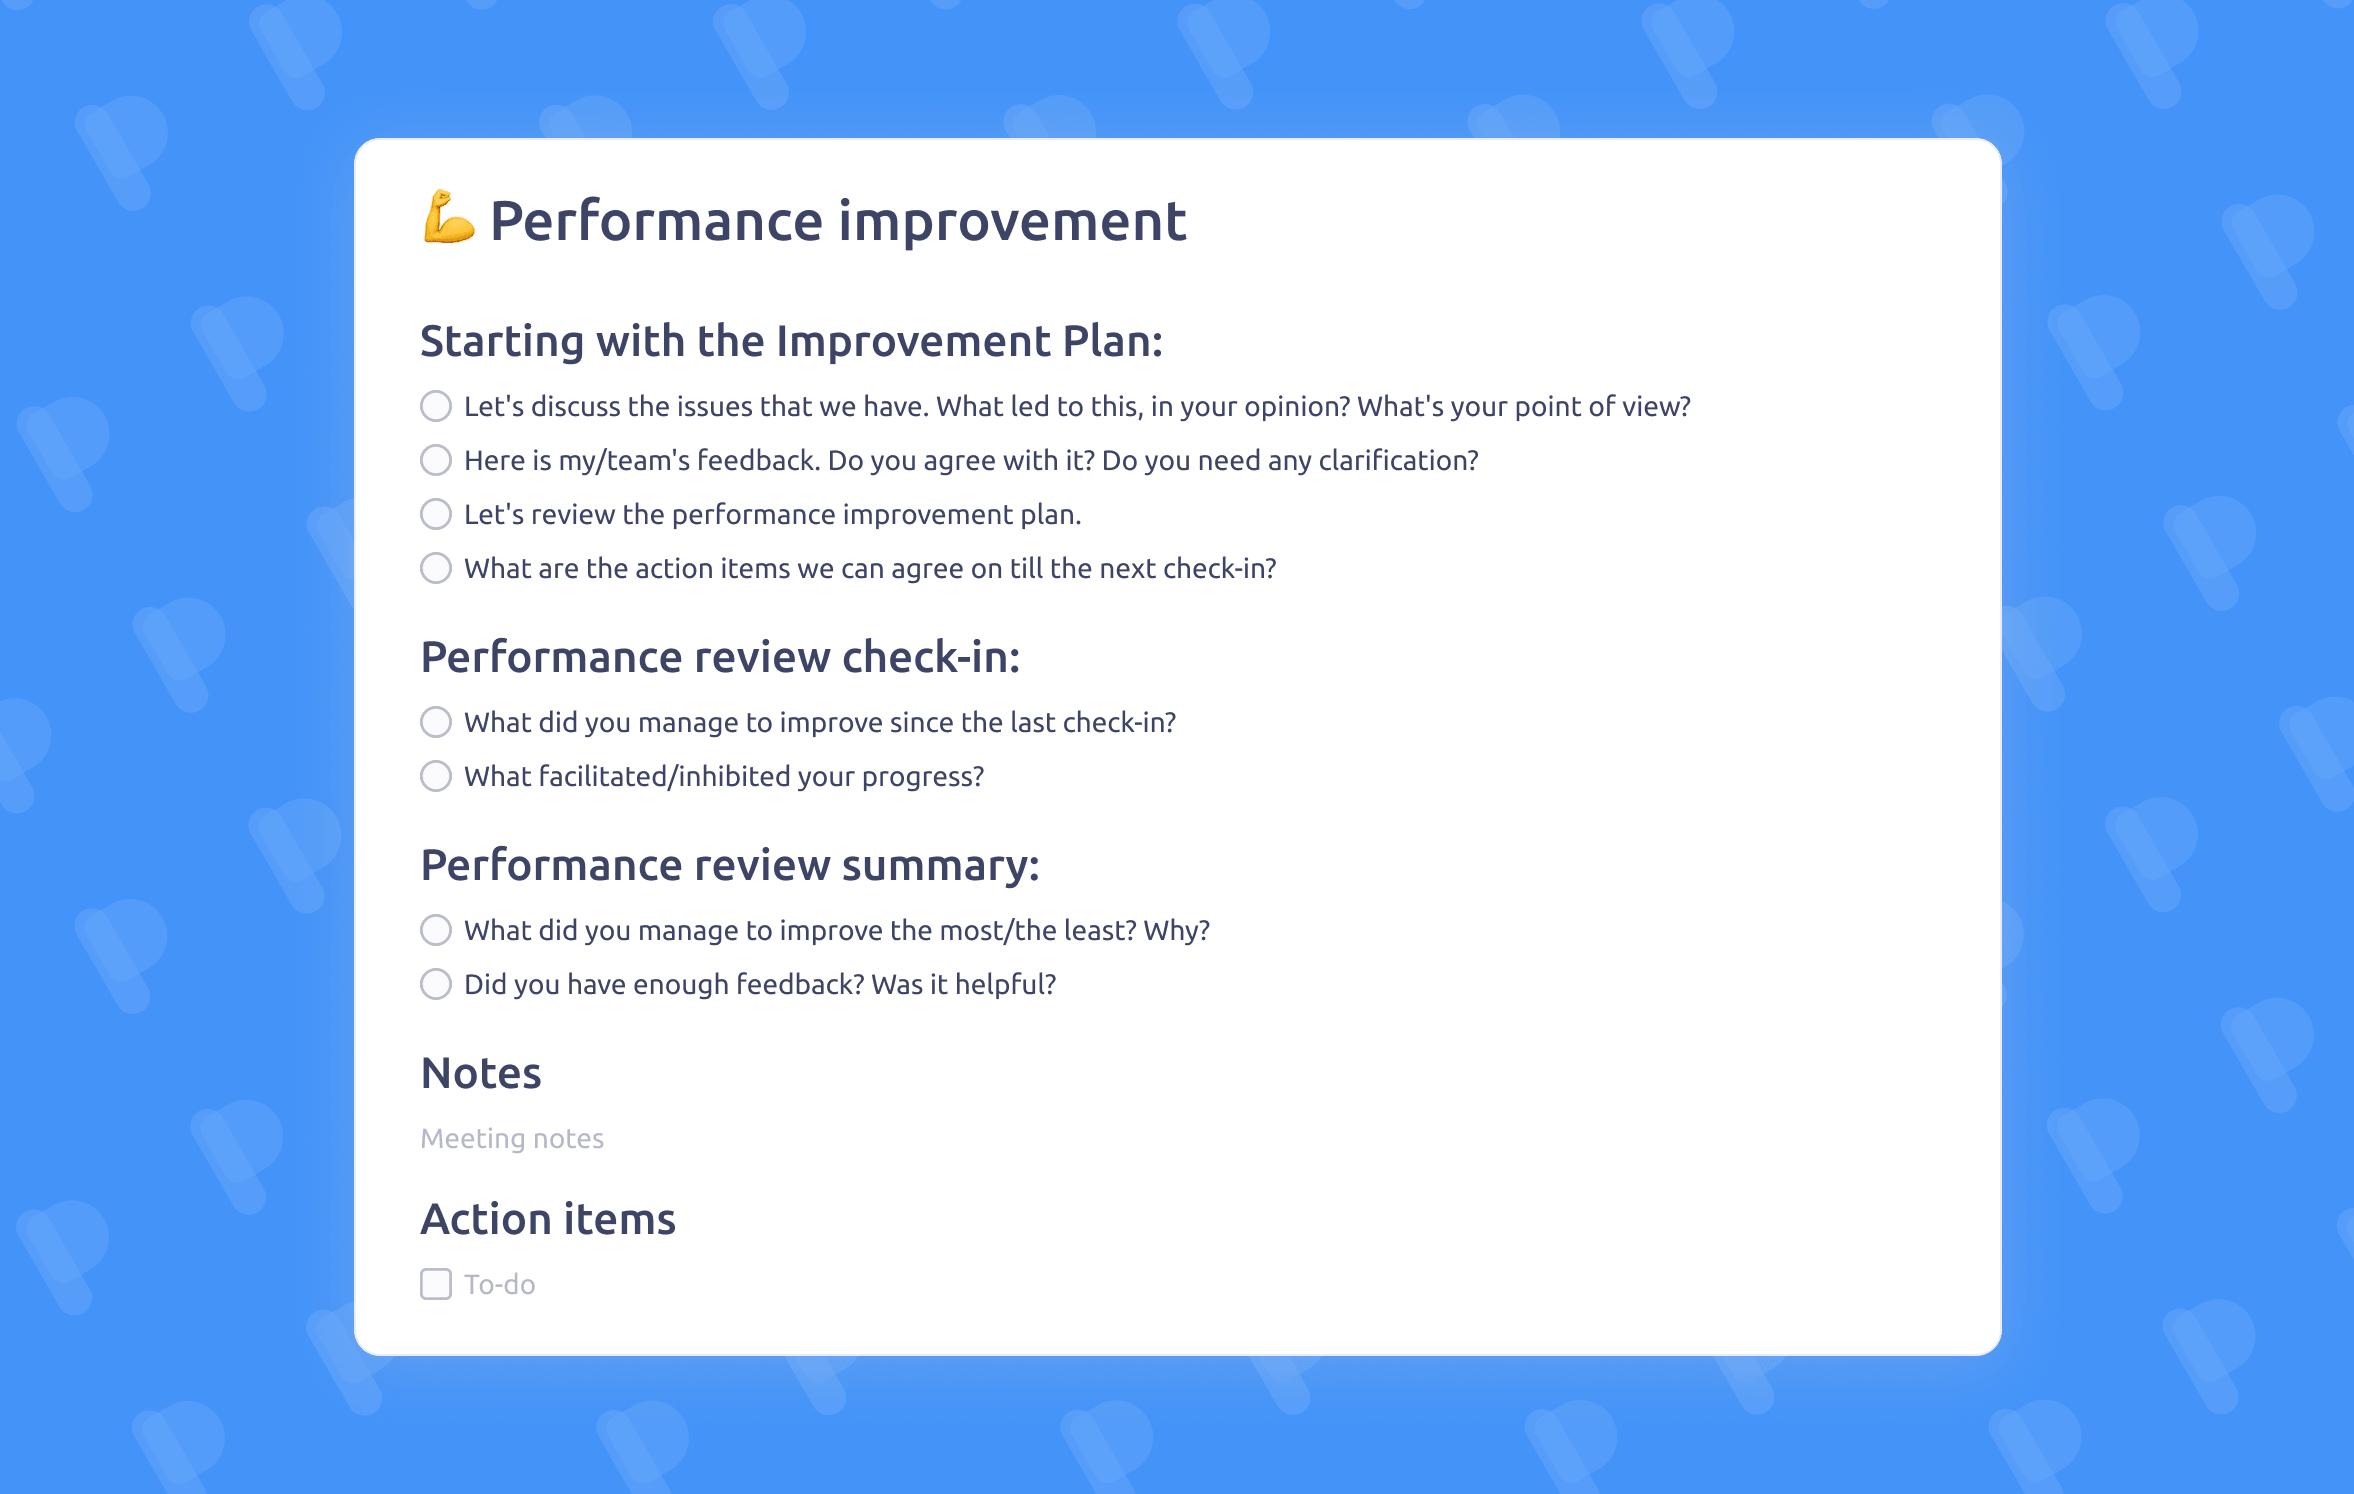 Performance improvement meeting template